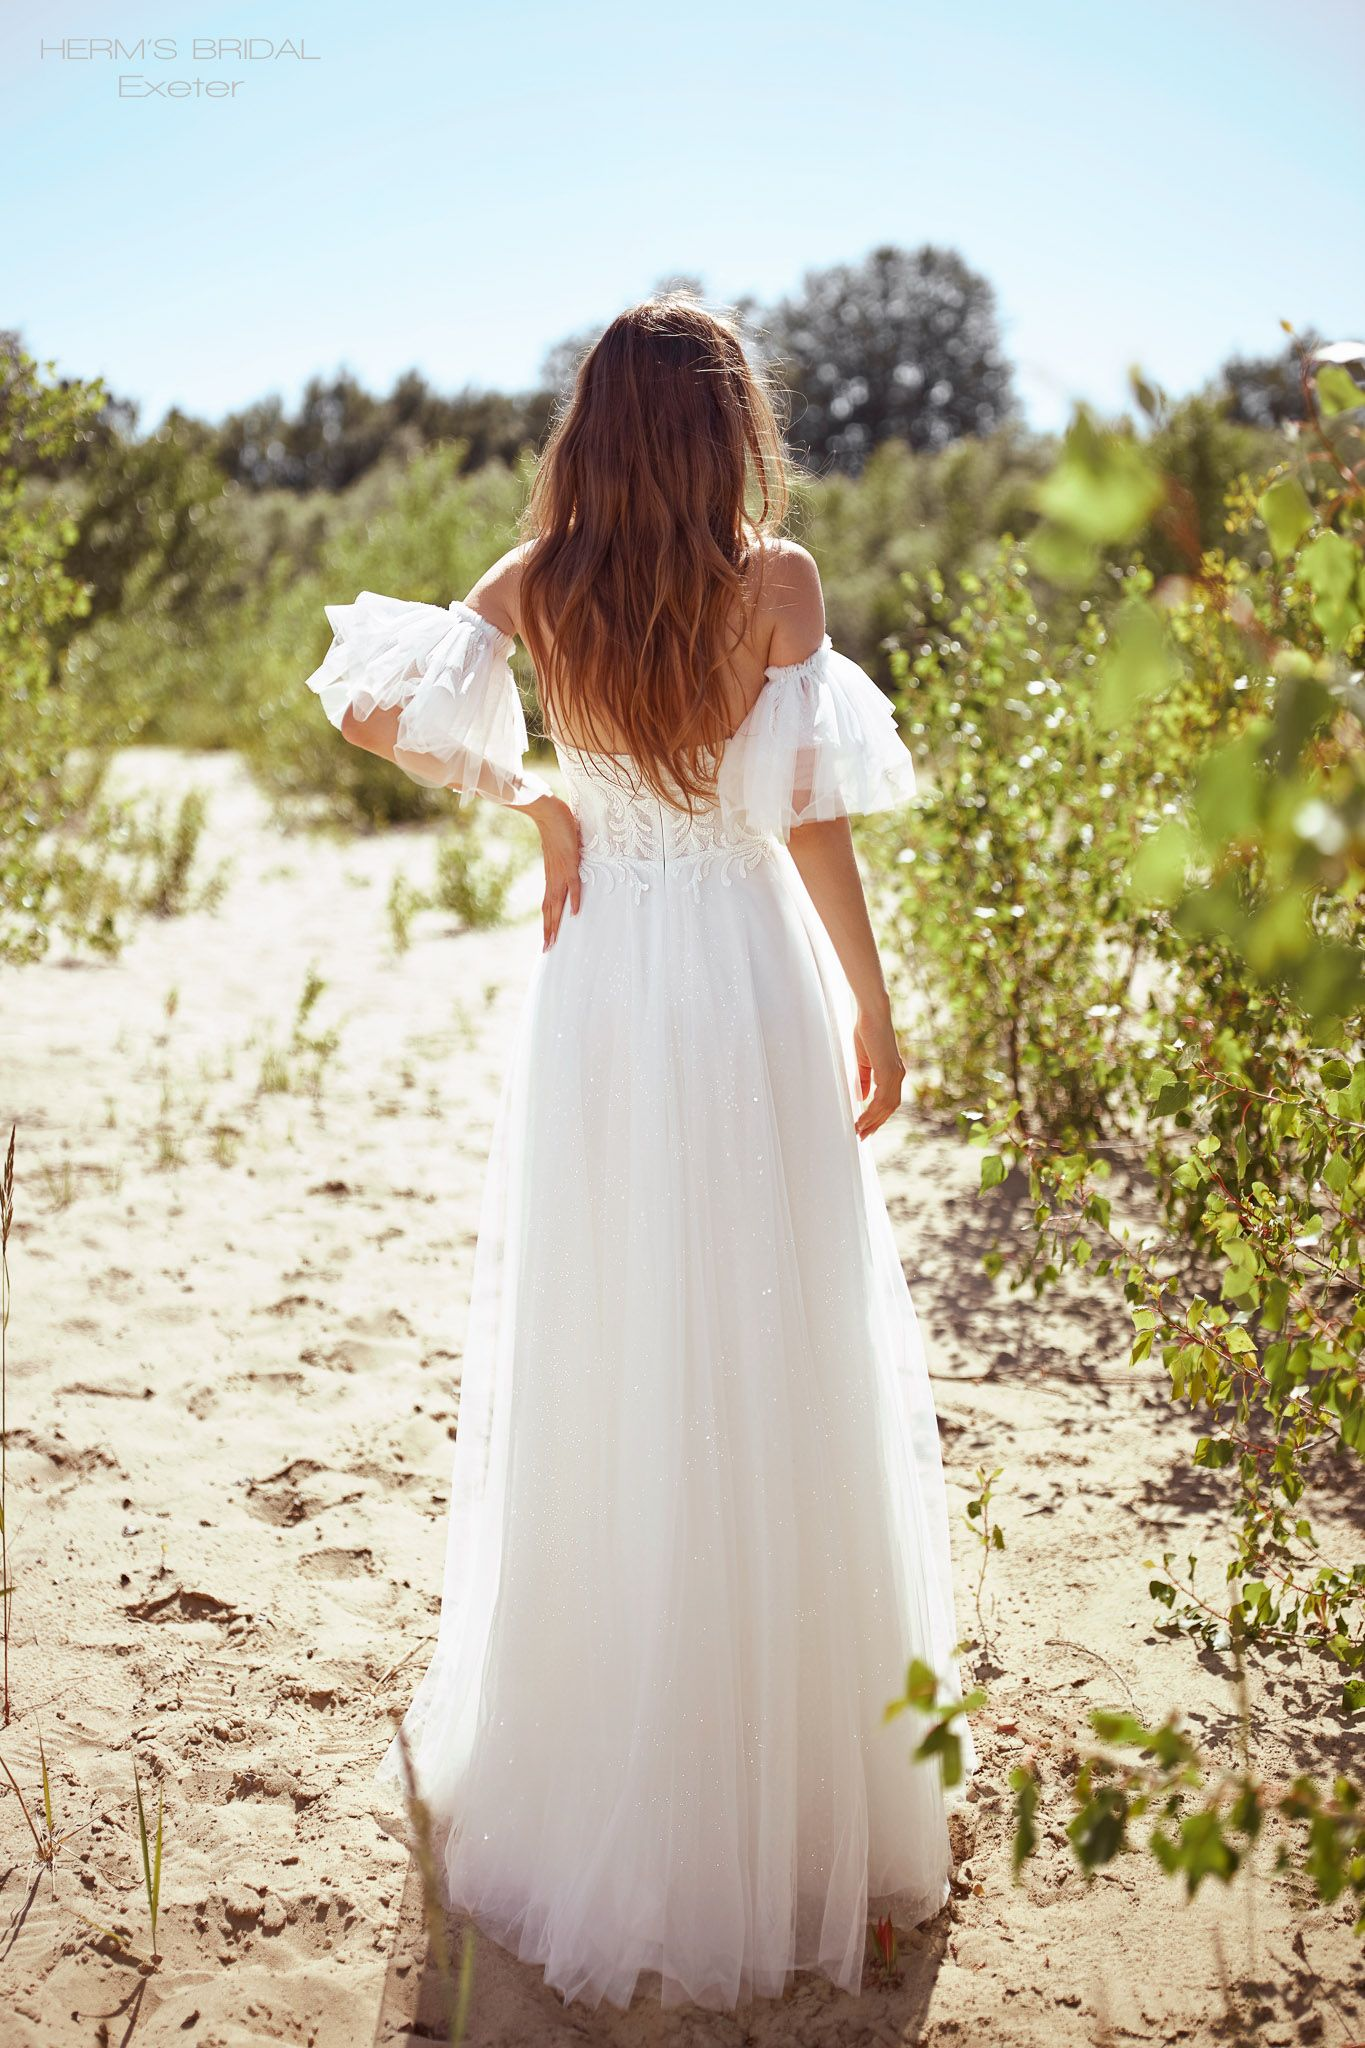 suknia slubna herms bridal Exeter